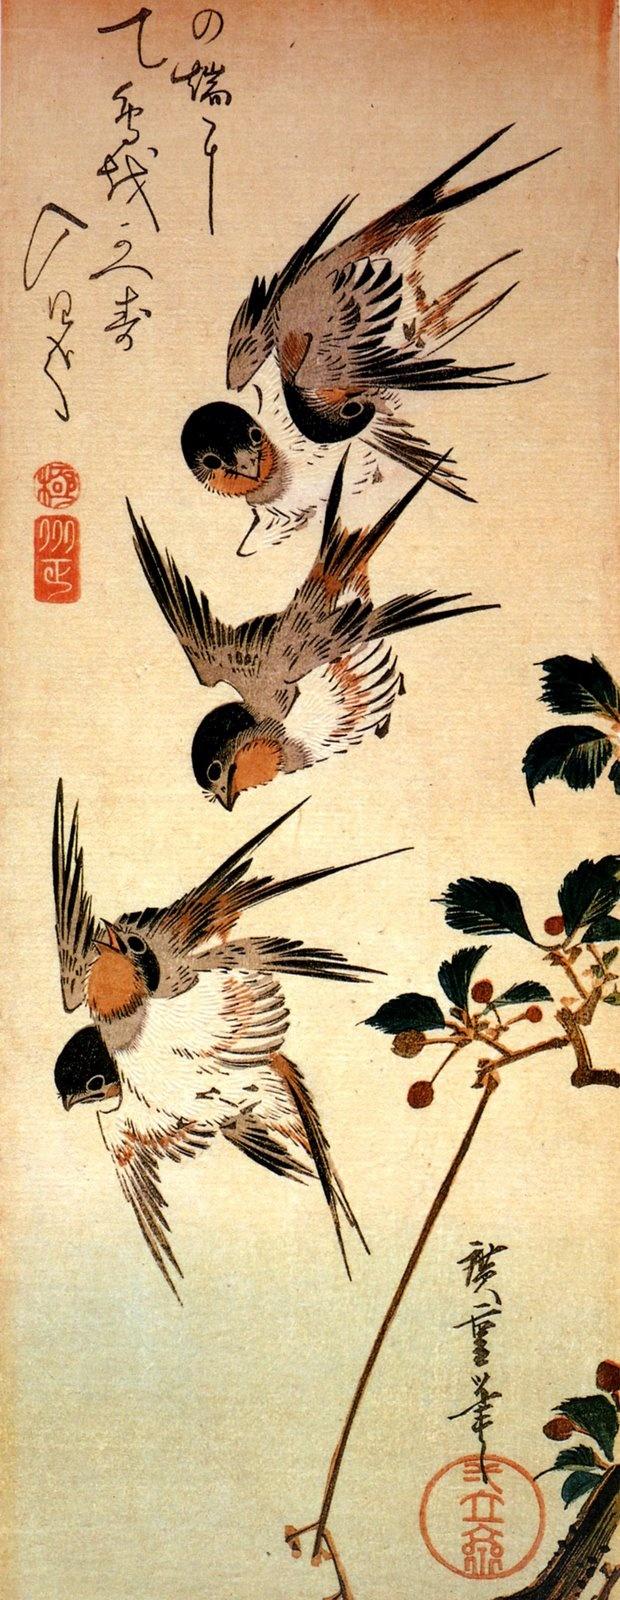 I know this isn't Art Nouveau, but I really like the style of these birds! [[ Utagawa Hiroshige ]]